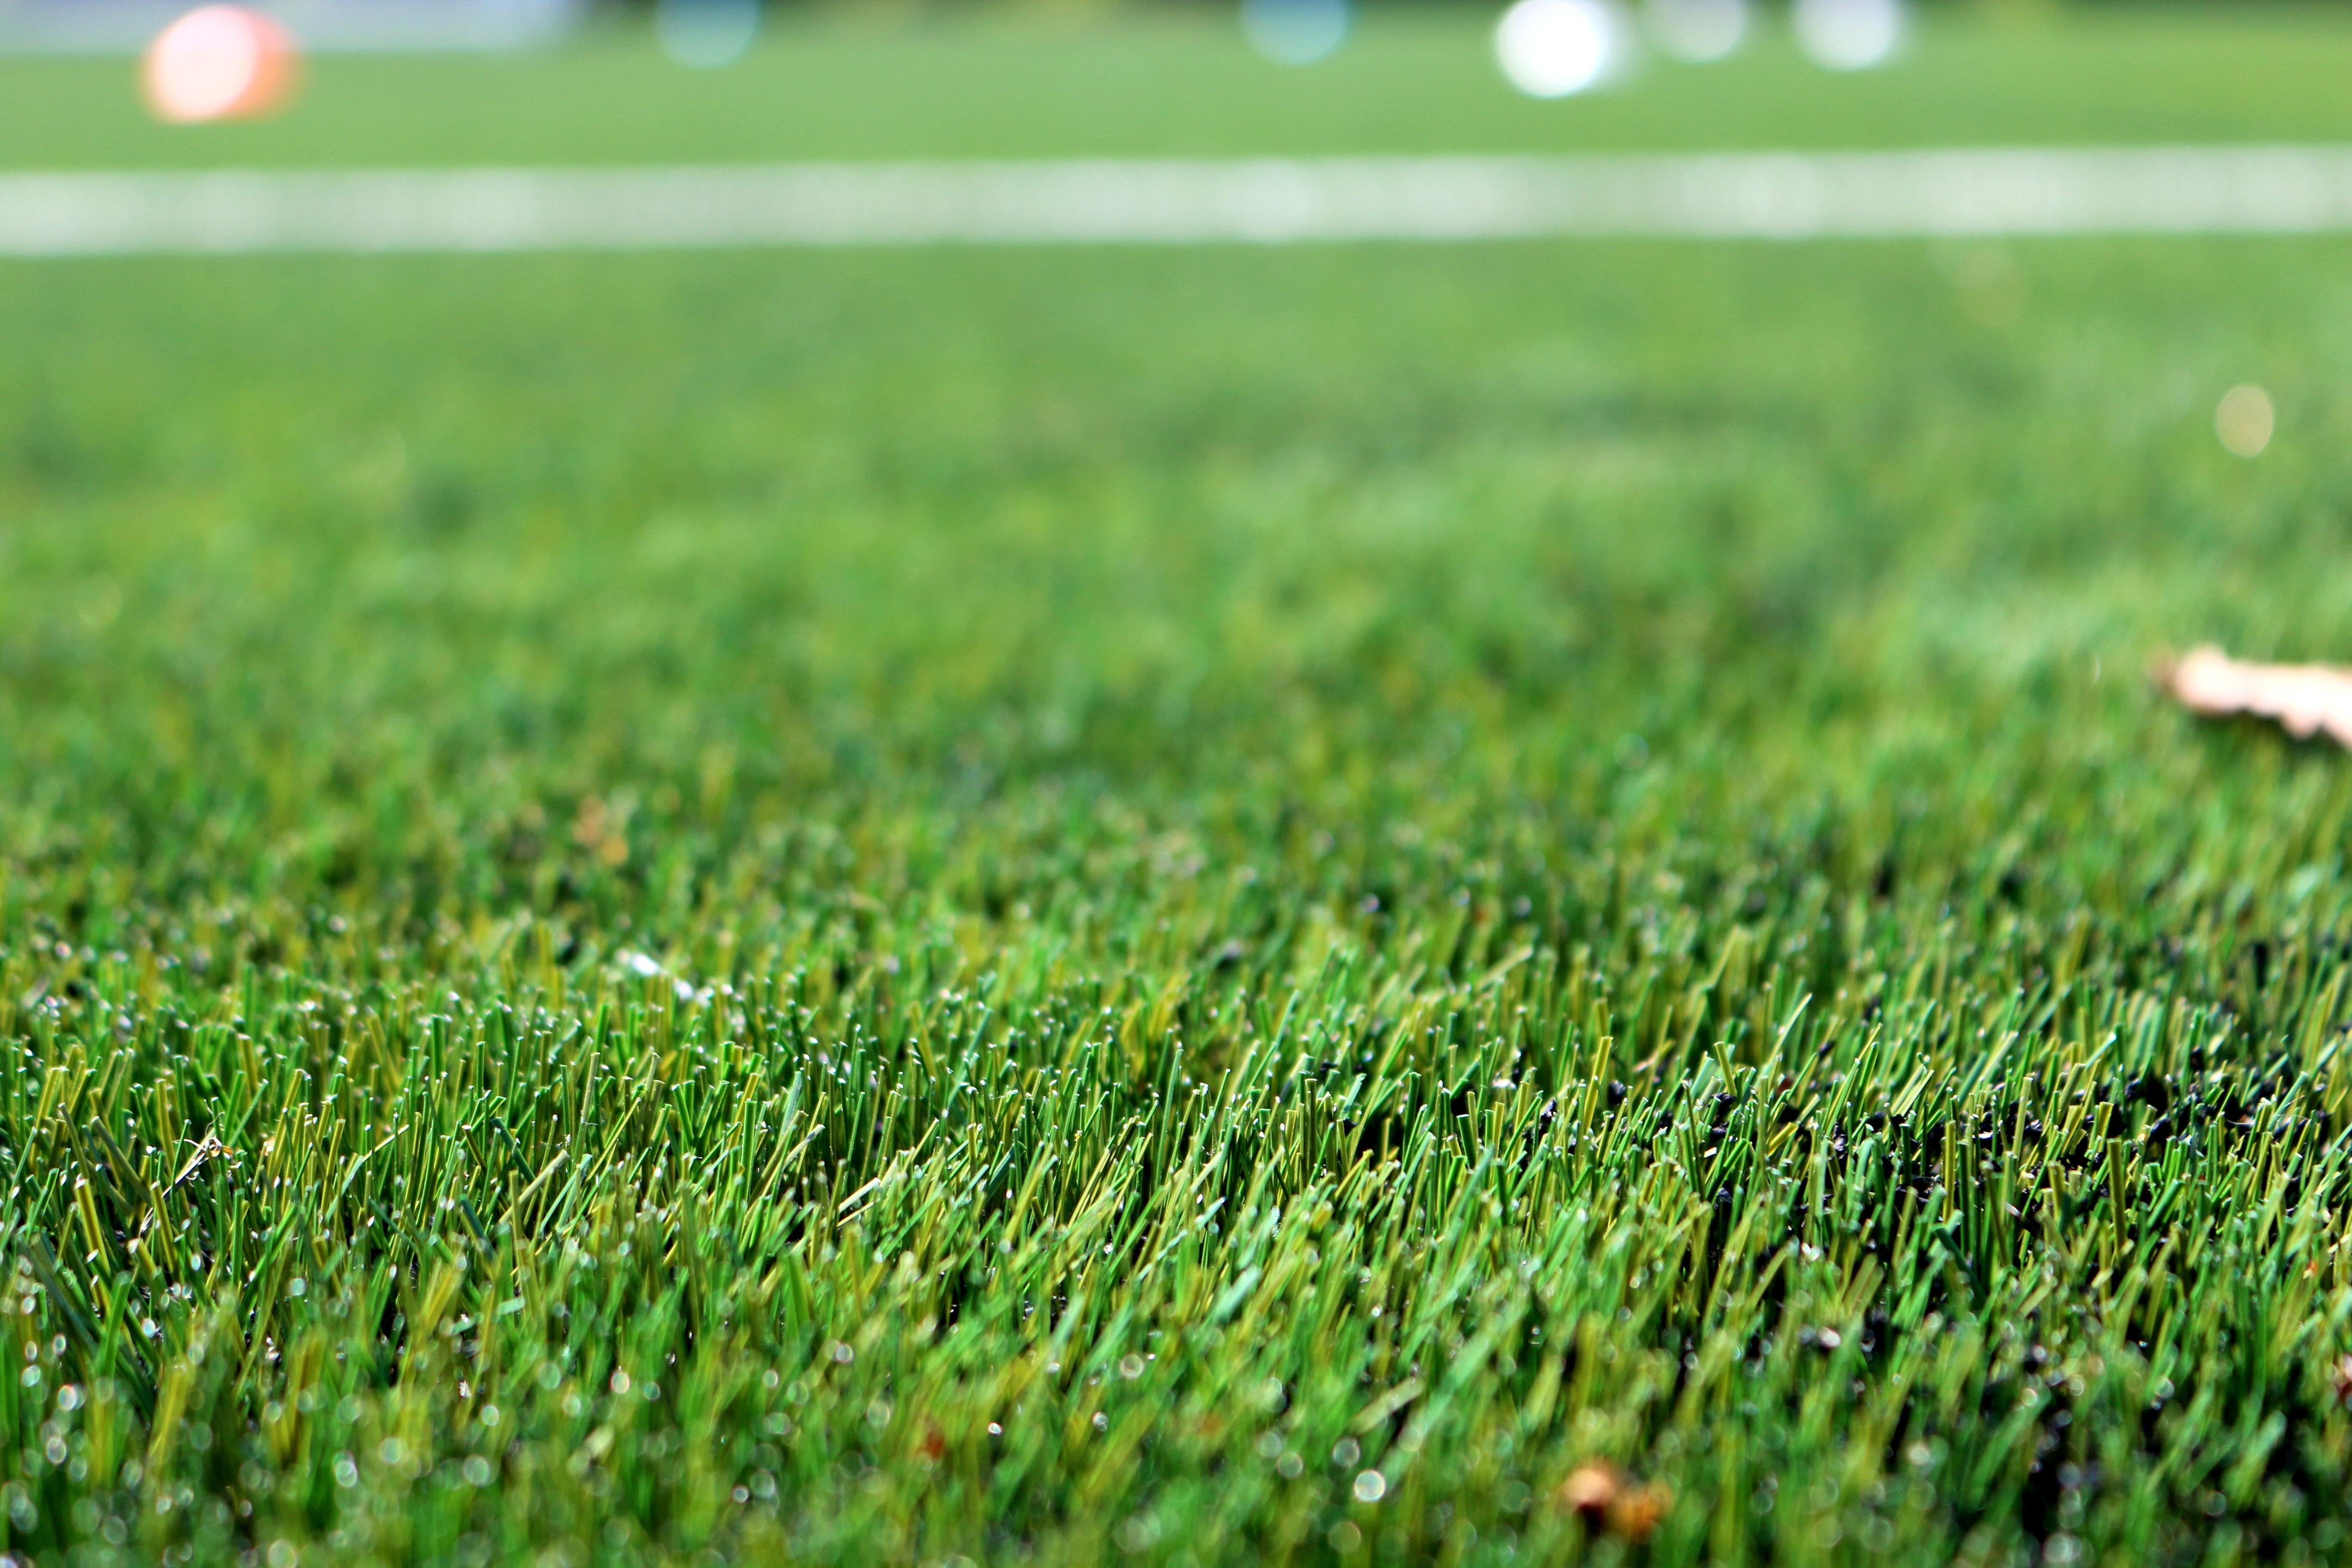 Kostenloses Foto Zum Thema Astro Rasen Feld Fussball